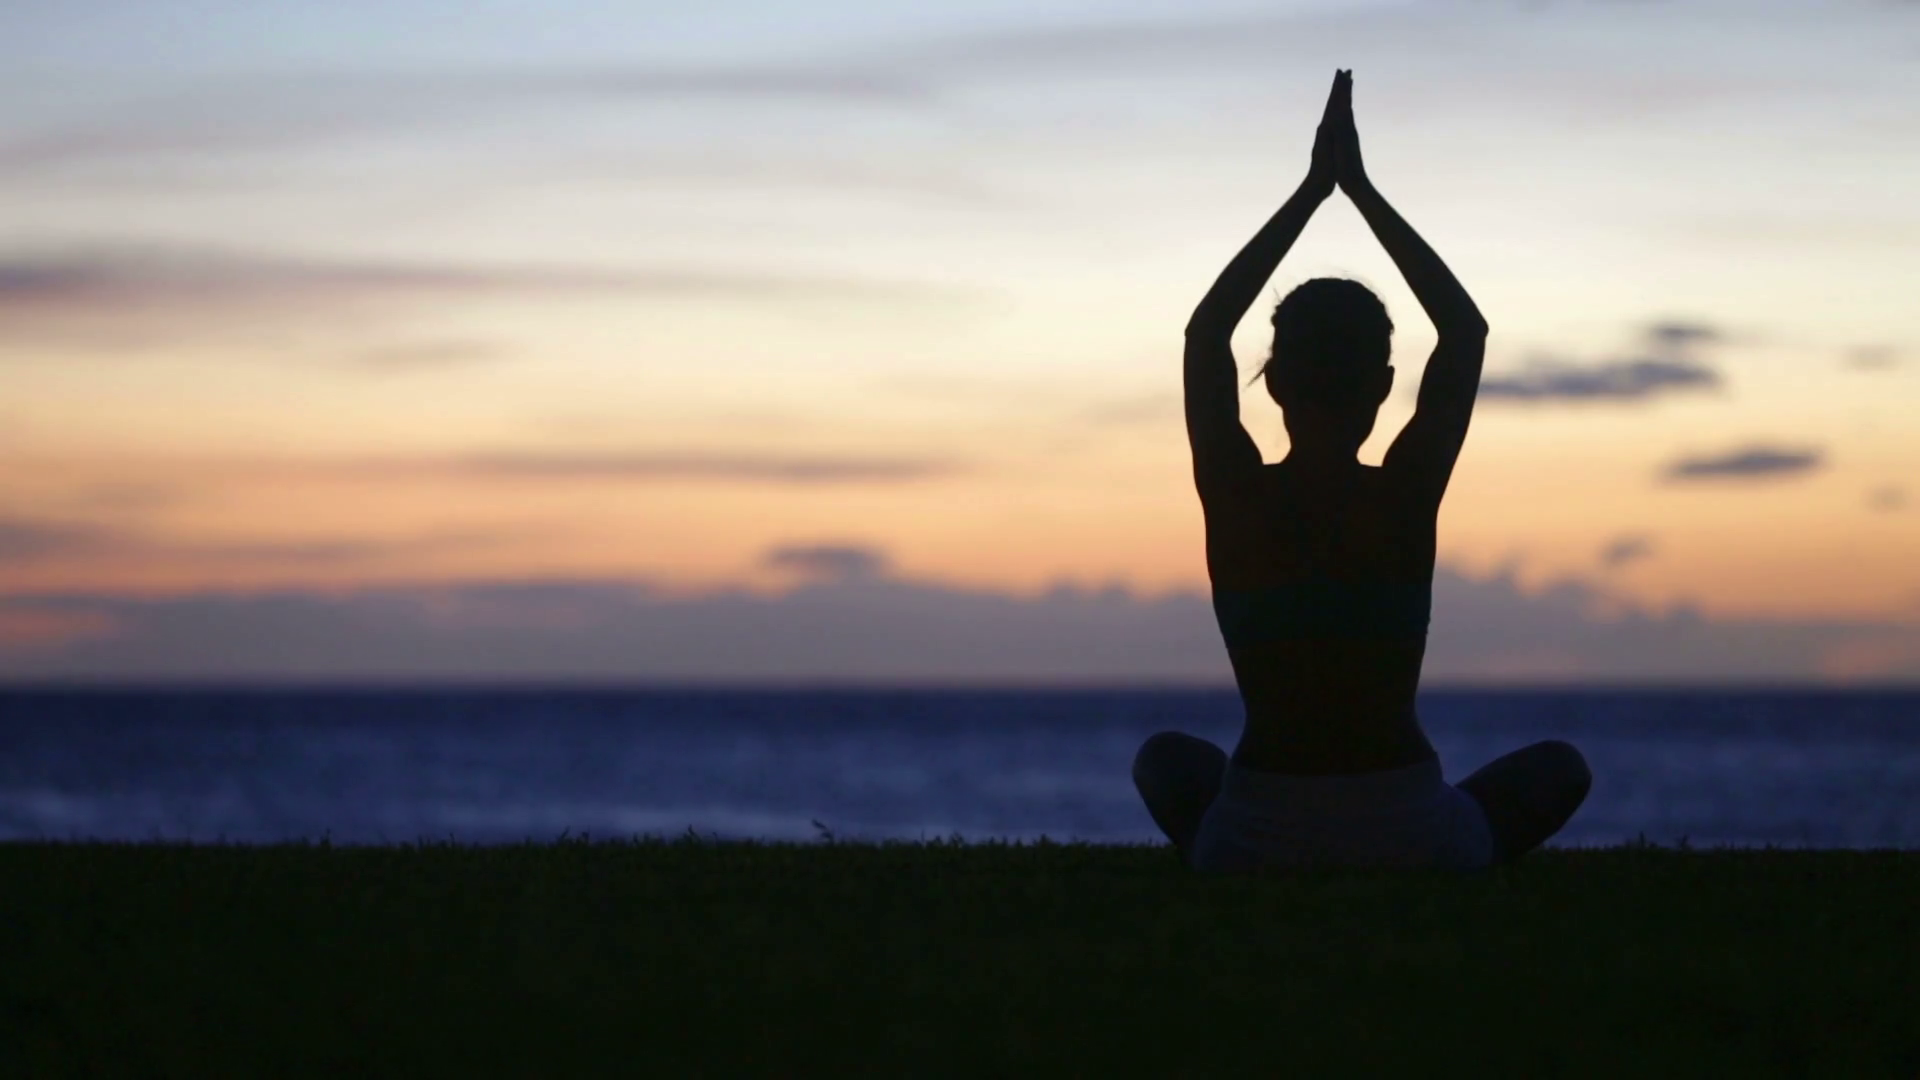 videoblocks-meditation-yoga-woman-meditating-at-beach-sunset-or-sunrise-relaxing-in-yoga-pose-serene-relaxed-female-yoga-instructor-in-calm-nature-sea-scene_rfvirhfj_thumbnail-full01.png